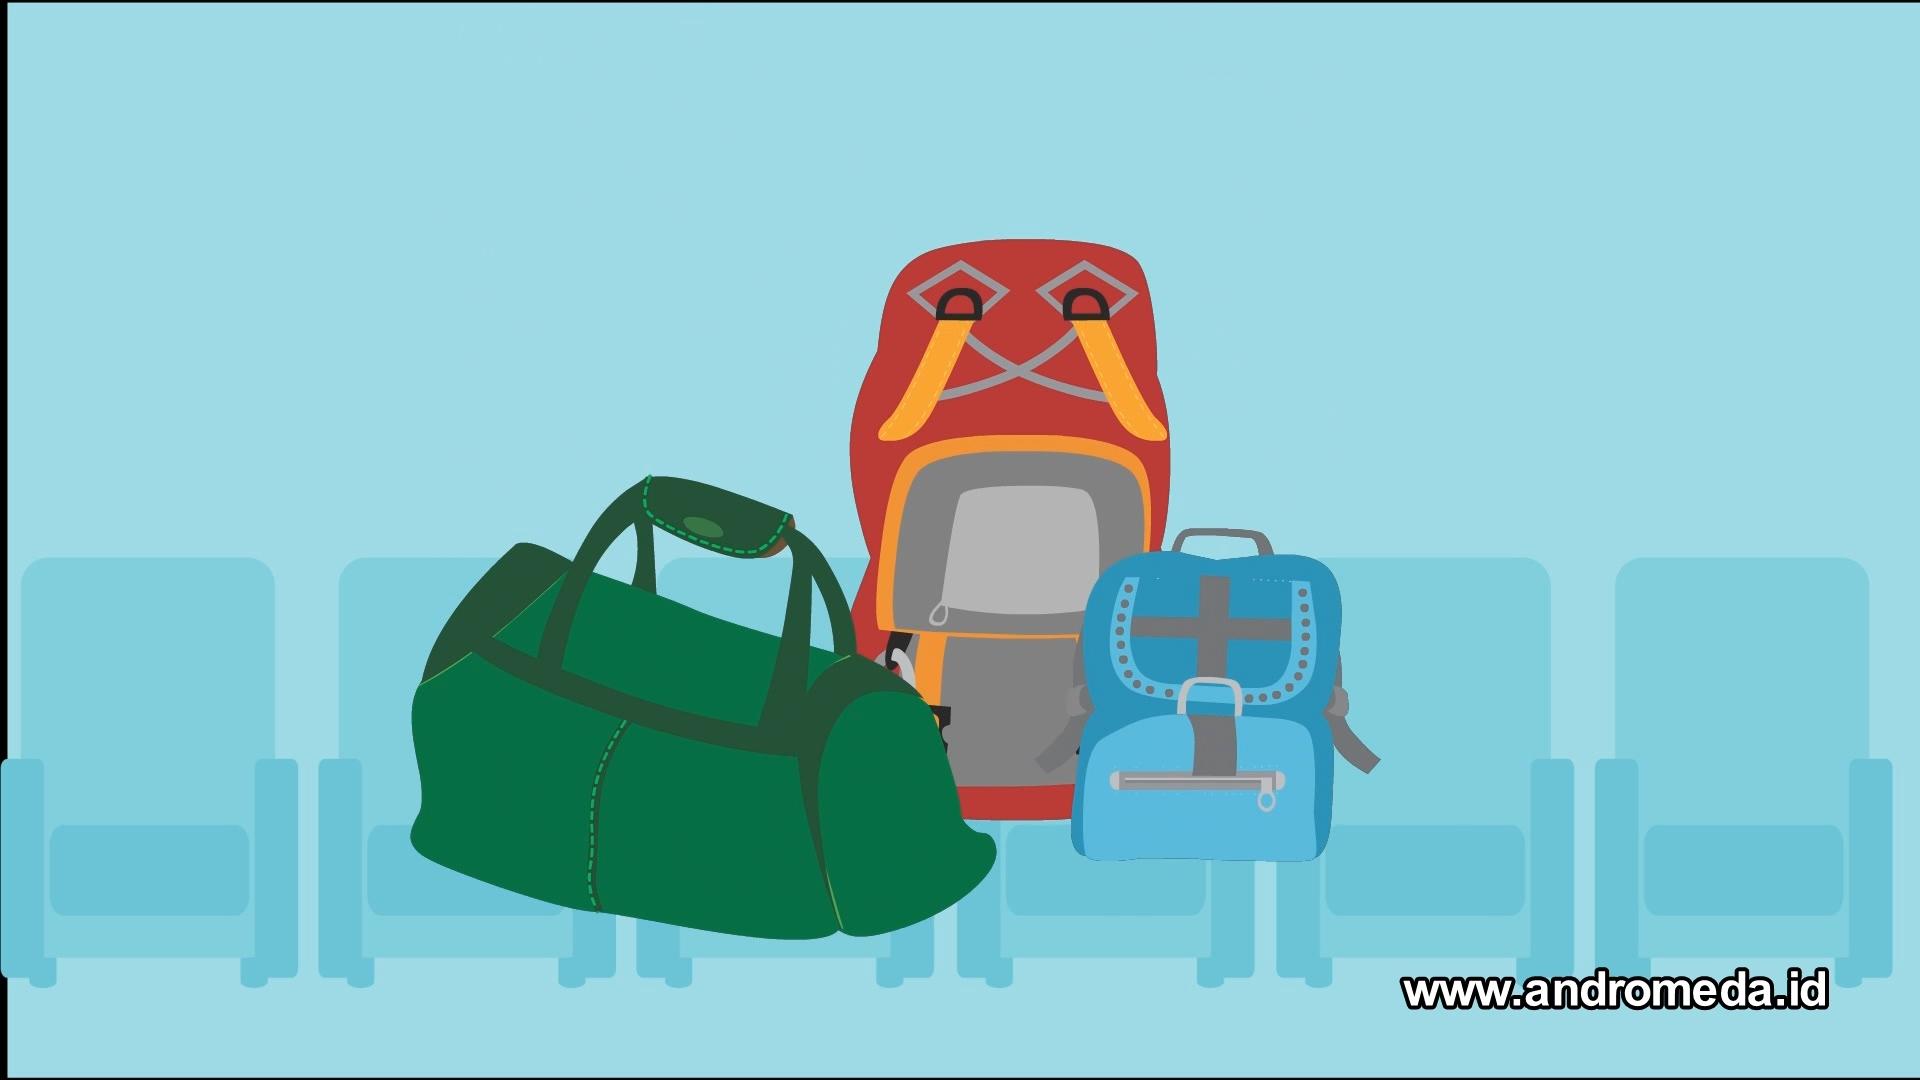 video keselamatan di kapal, video safety animasi keselamatan di kapal, video safety briefing di kapal, video safety induction di kapal, video safety animasi di kapal, safety video, infographic video, video infographic, infographic design, video infografis, infografis animasi, animasi infografis